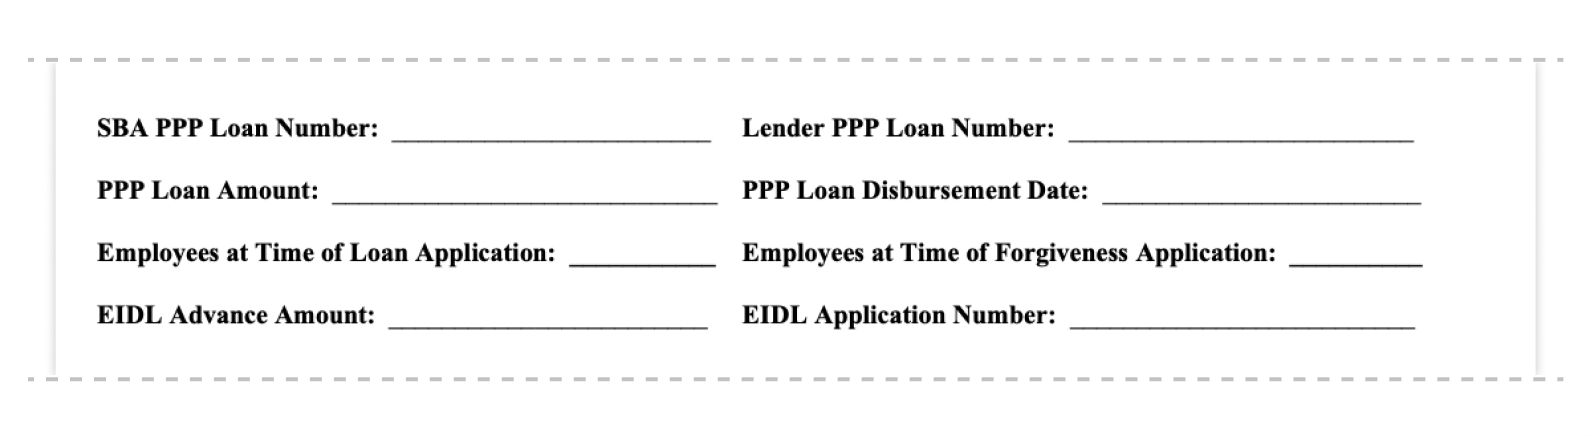 ppp loan forgiveness application form 3508ez loan information